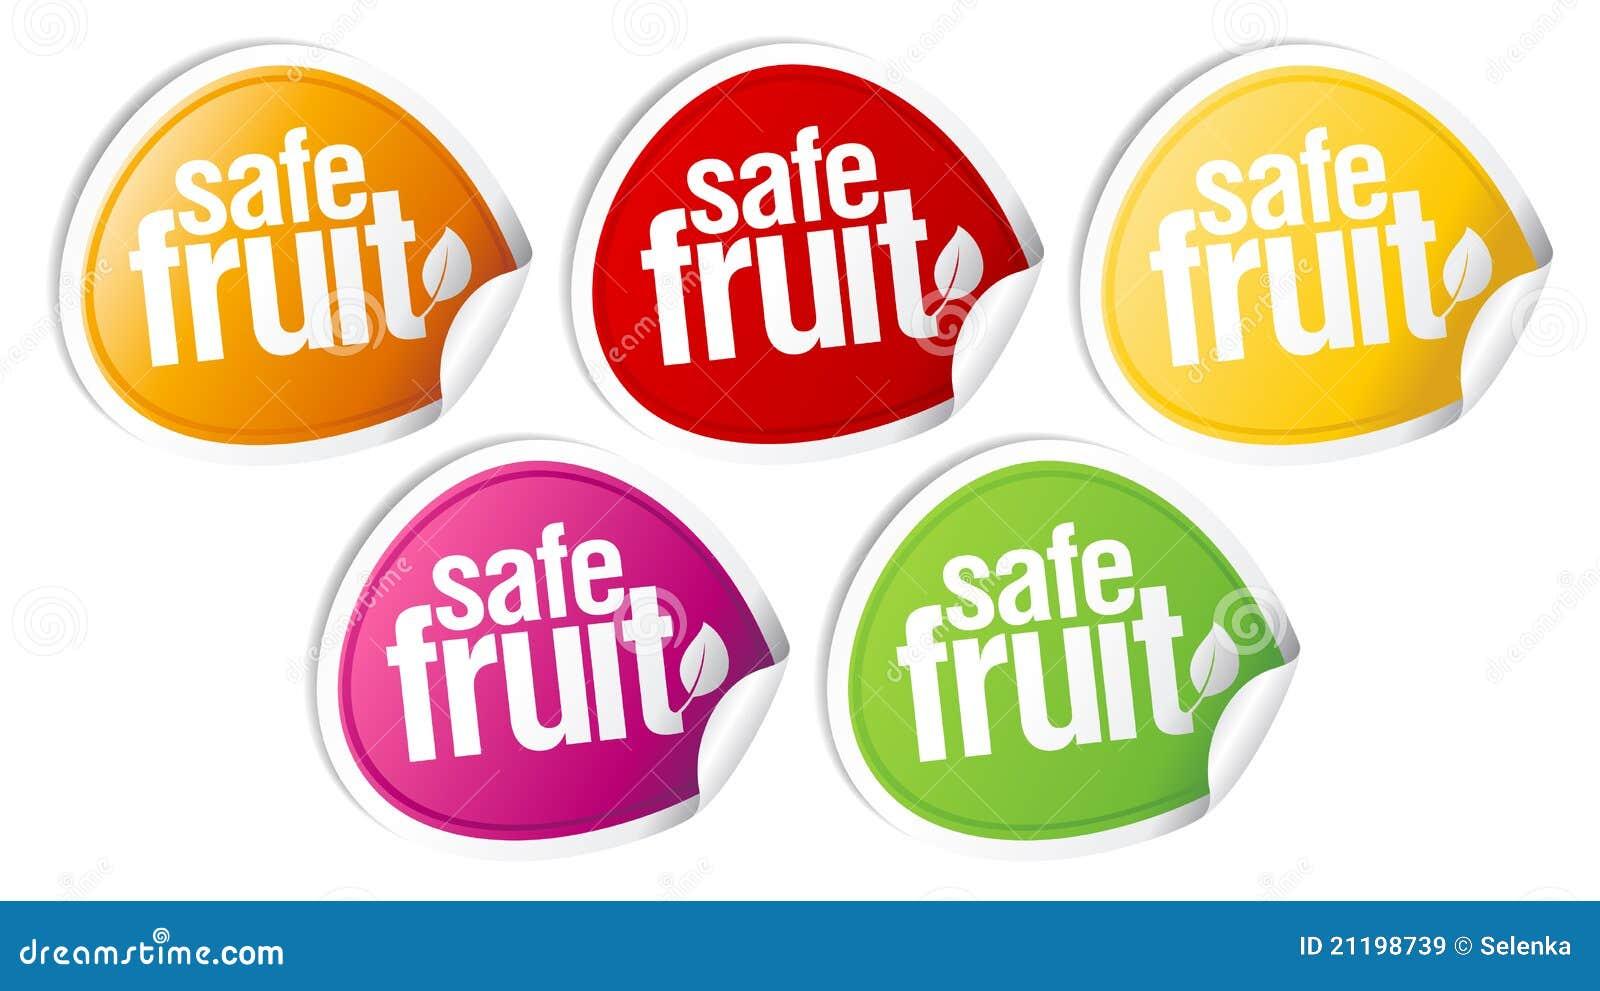 Safe fruit stickers.